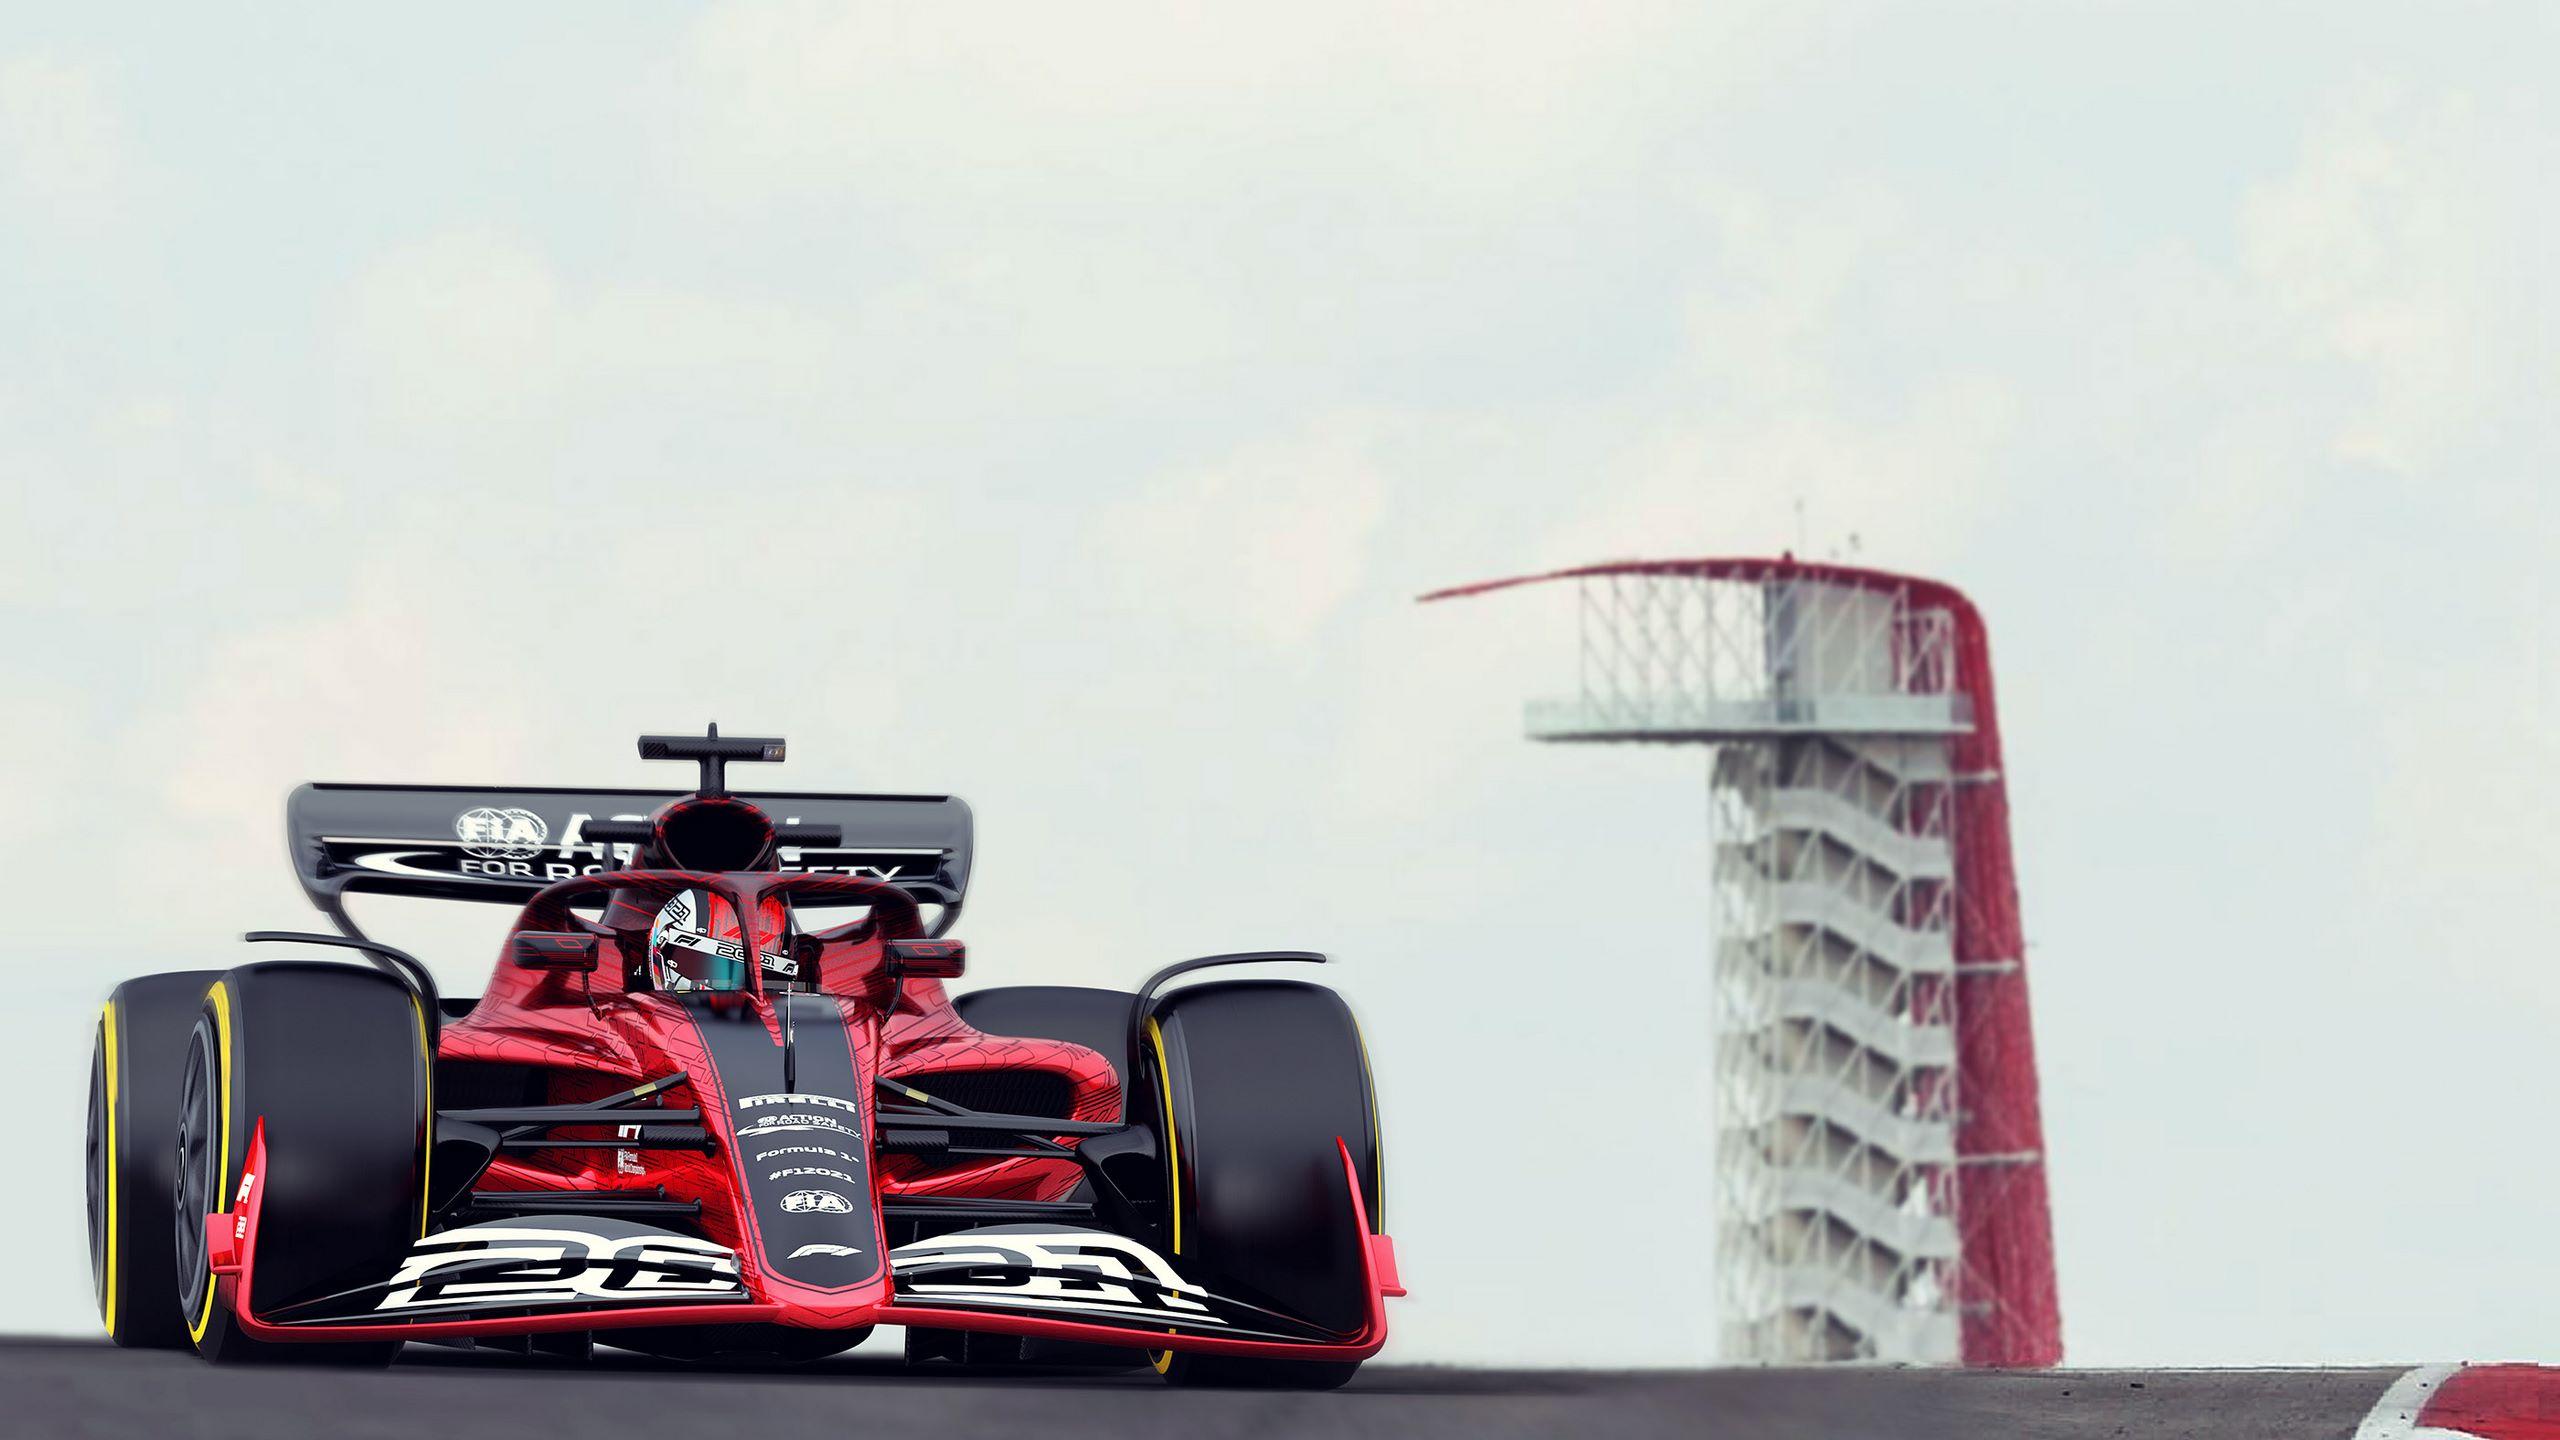 2021-formula-1-race-car-rendering f1 (7)